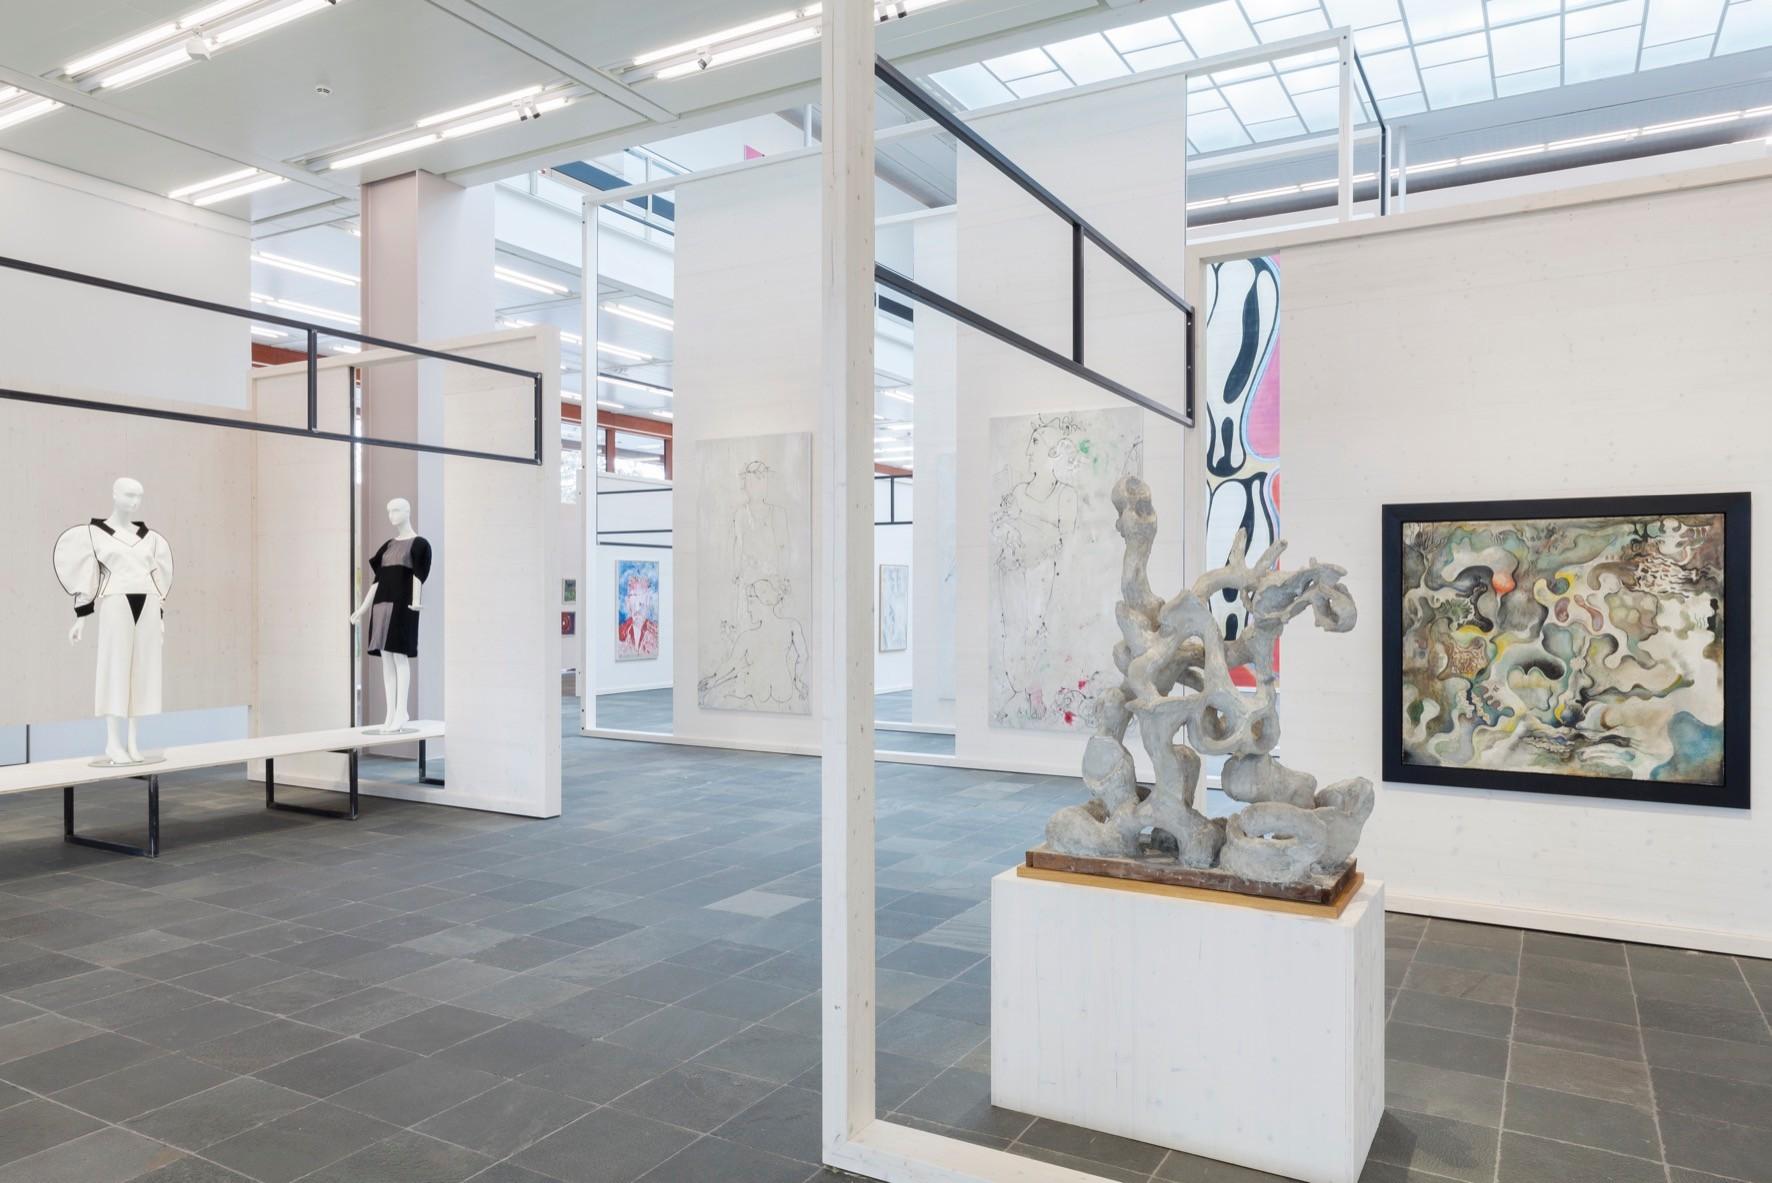 Ausstellungsansicht Oswald Oberhuber, 2016 Foto: © Belvedere, Wien.